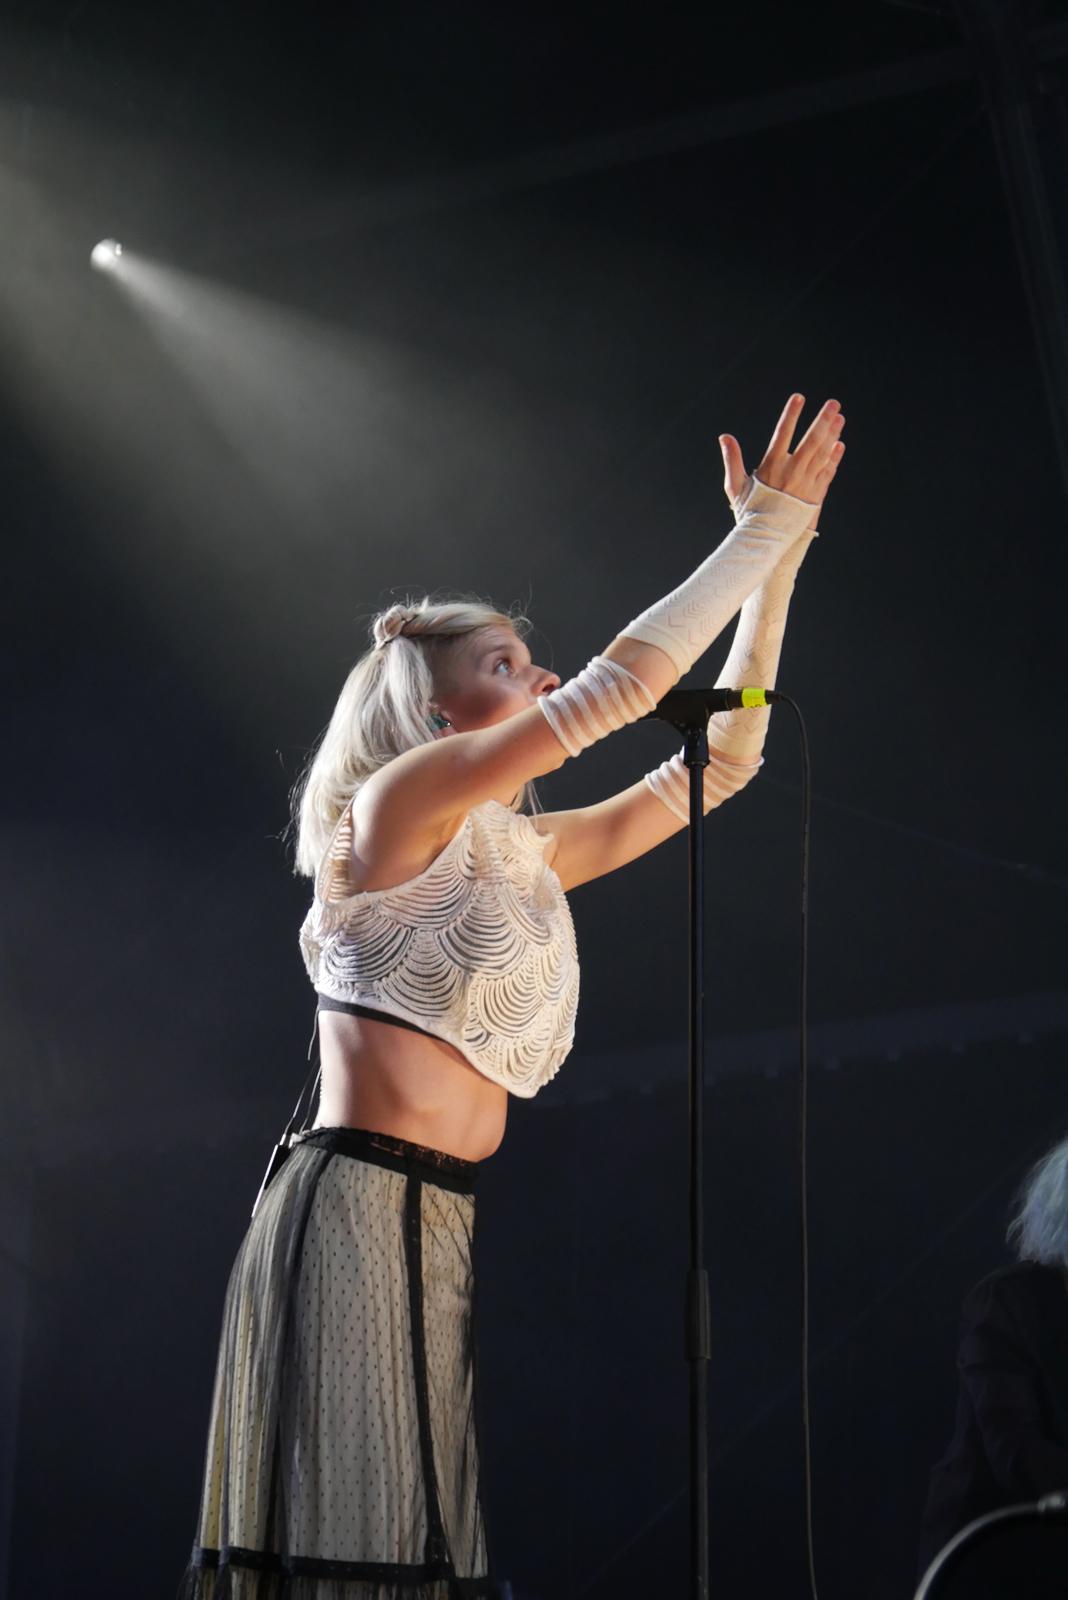 Aurora live concert Rock en Seine 2016 music festival Paris stage photo usofparis blog